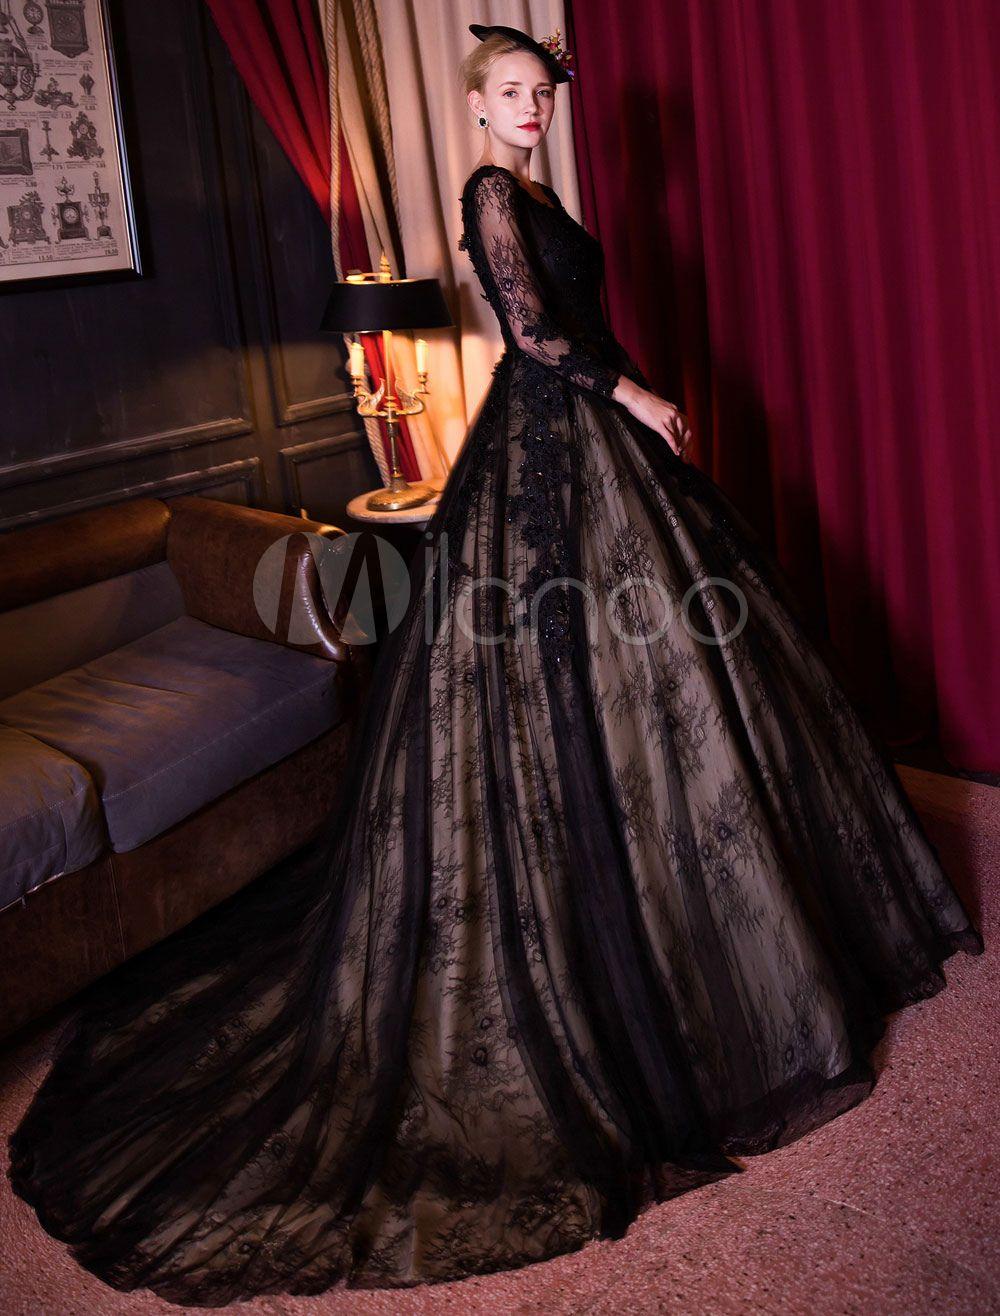 Black Wedding Dress Princess Lace Backless Quinceanera Dress Long Sleeve Illusion Beaded Bridal Gown With Train Lace Princess Wedding Dresses Princess Wedding Dresses Quinceanera Dresses [ 1316 x 1000 Pixel ]